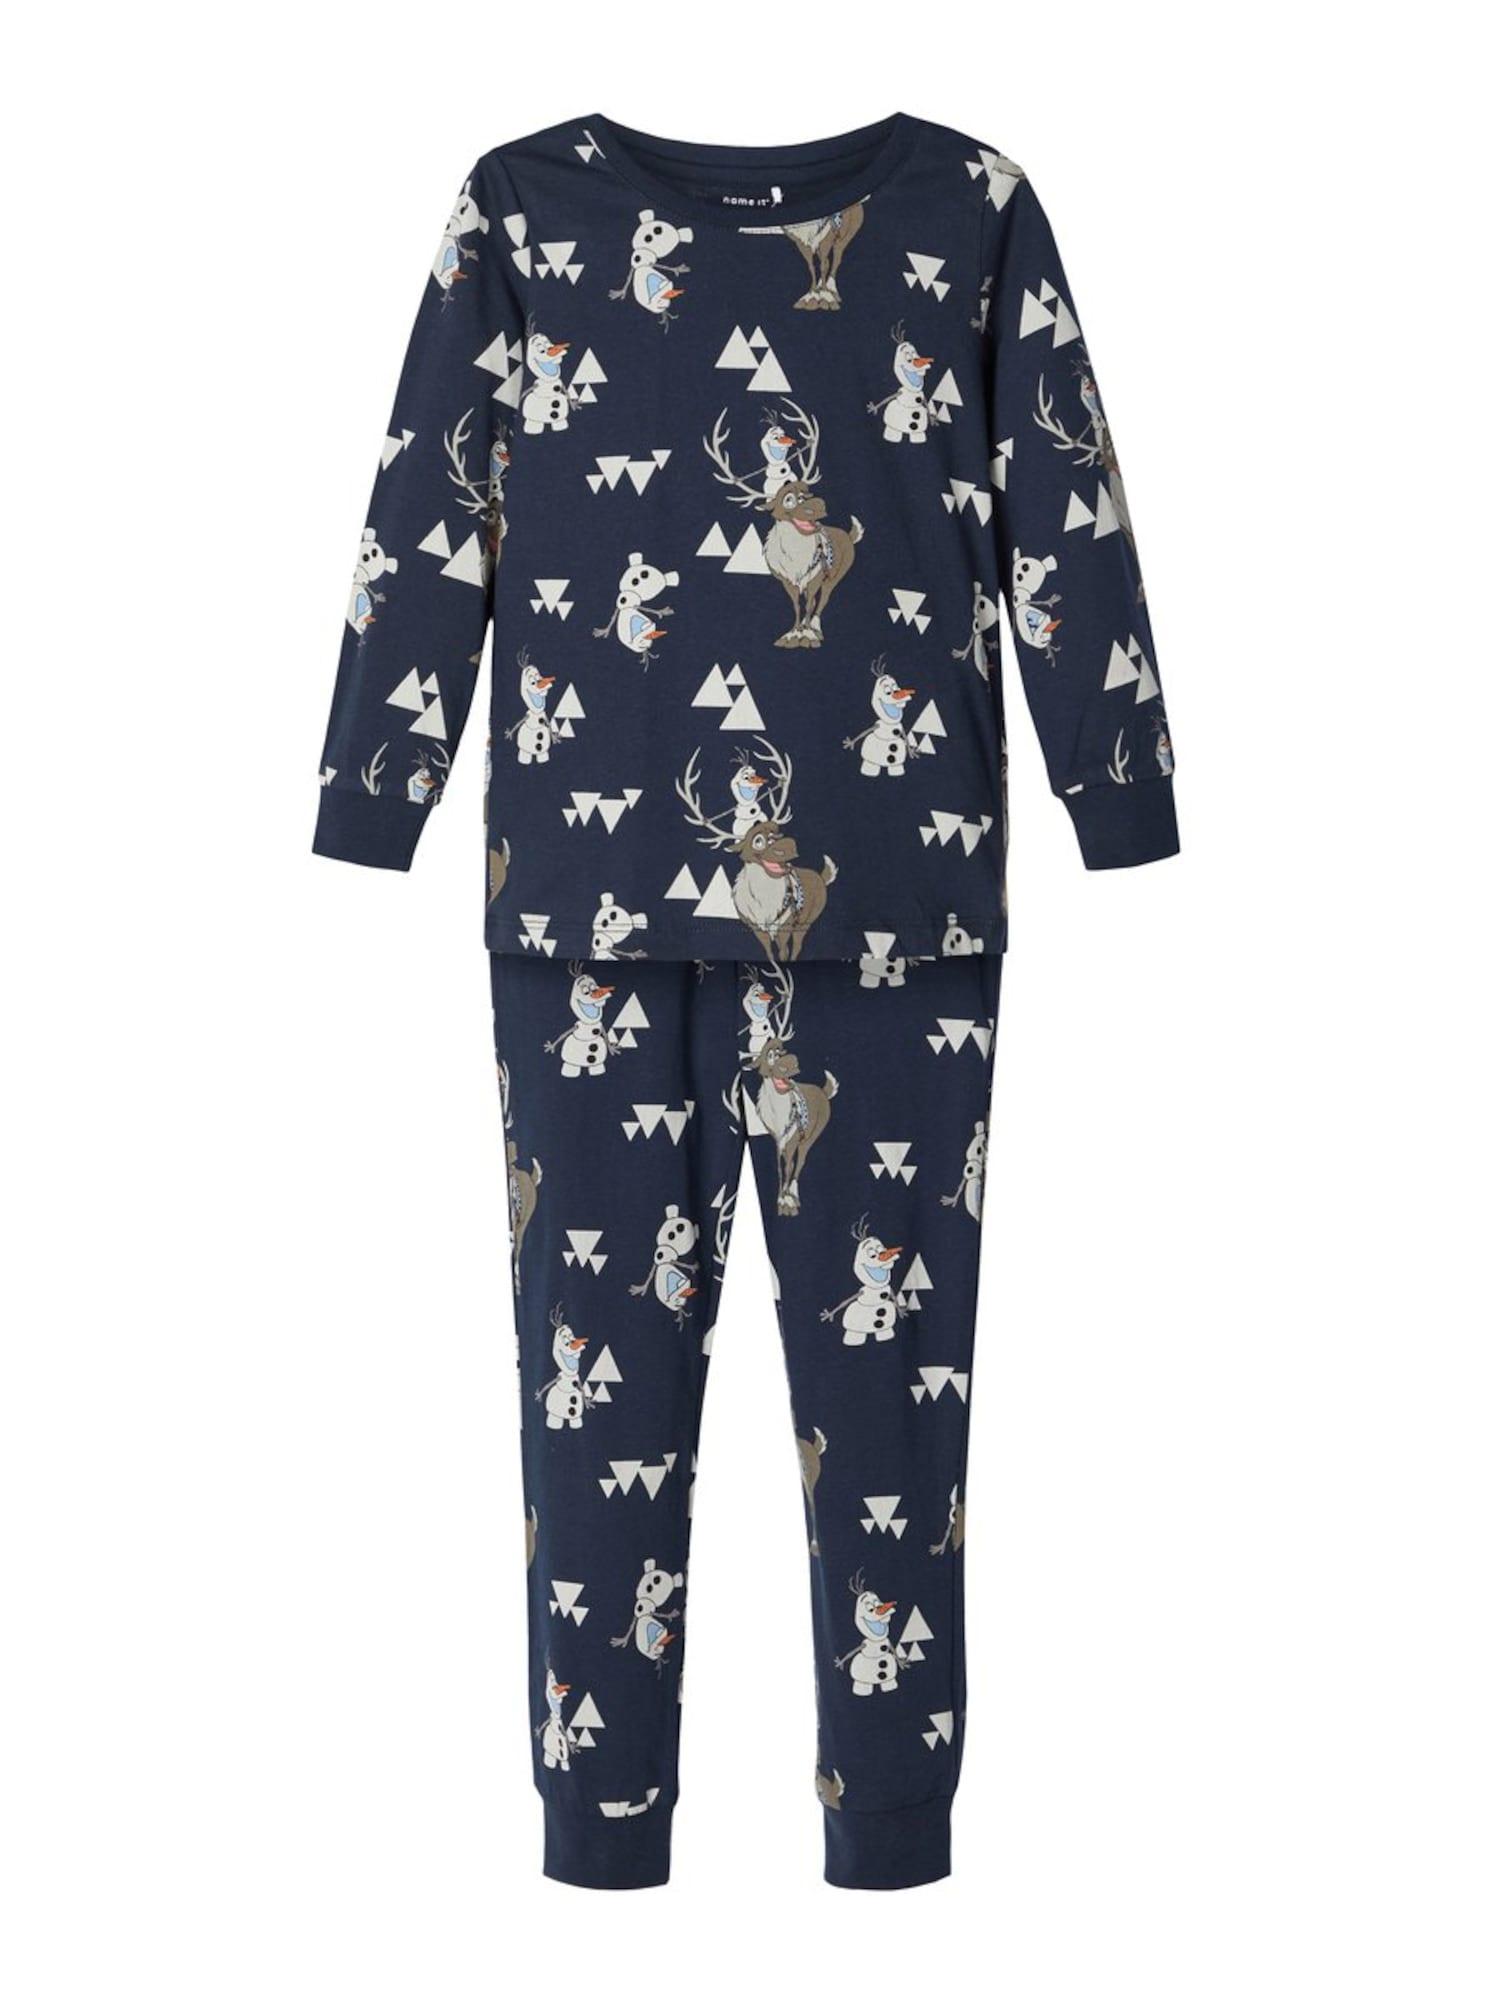 NAME IT Miego kostiumas 'Disney Olaf' tamsiai mėlyna / mišrios spalvos